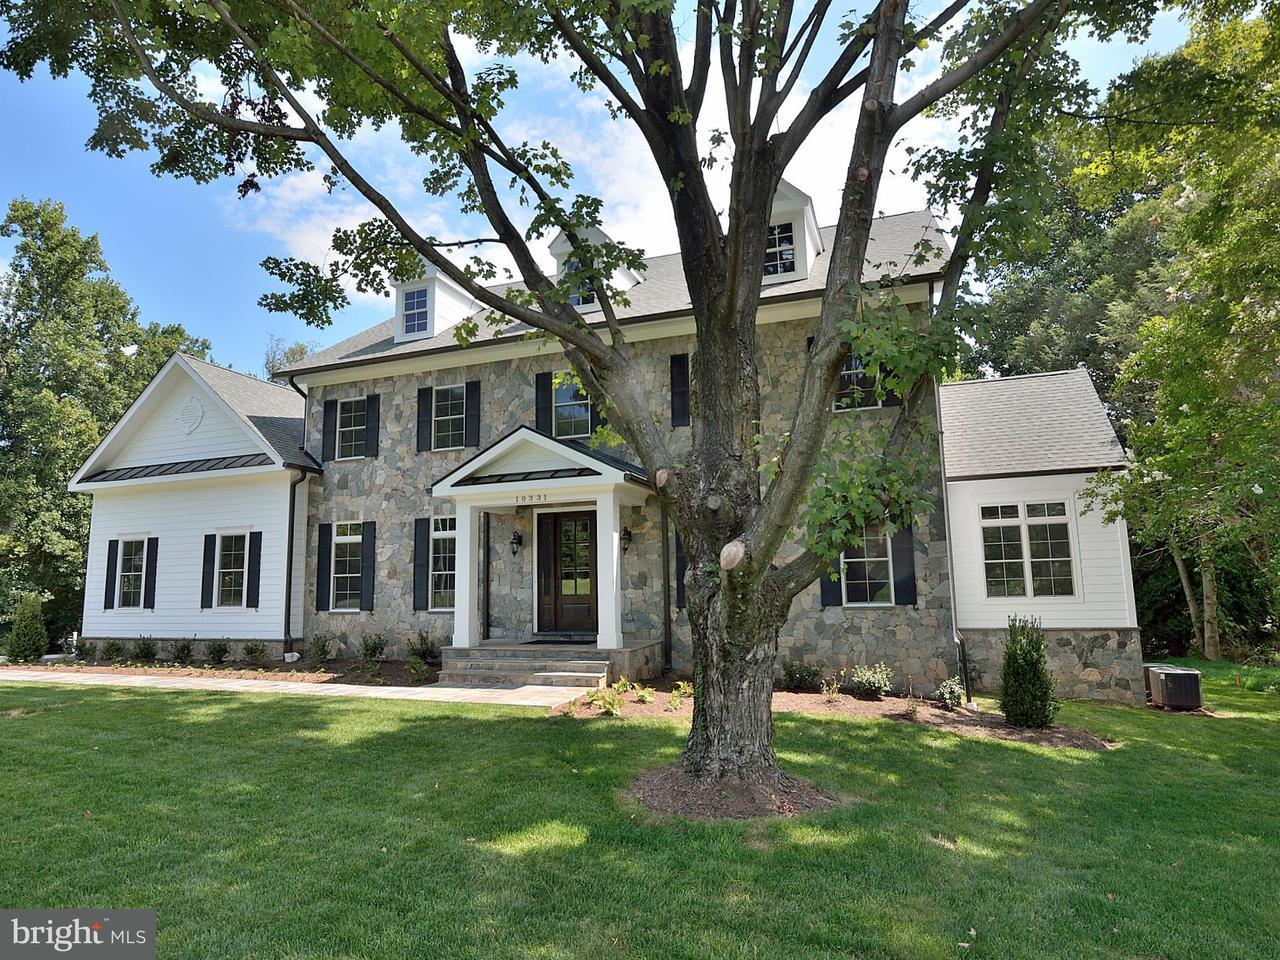 Single Family Home for Sale at 10331 Carol Street 10331 Carol Street Great Falls, Virginia 22066 United States